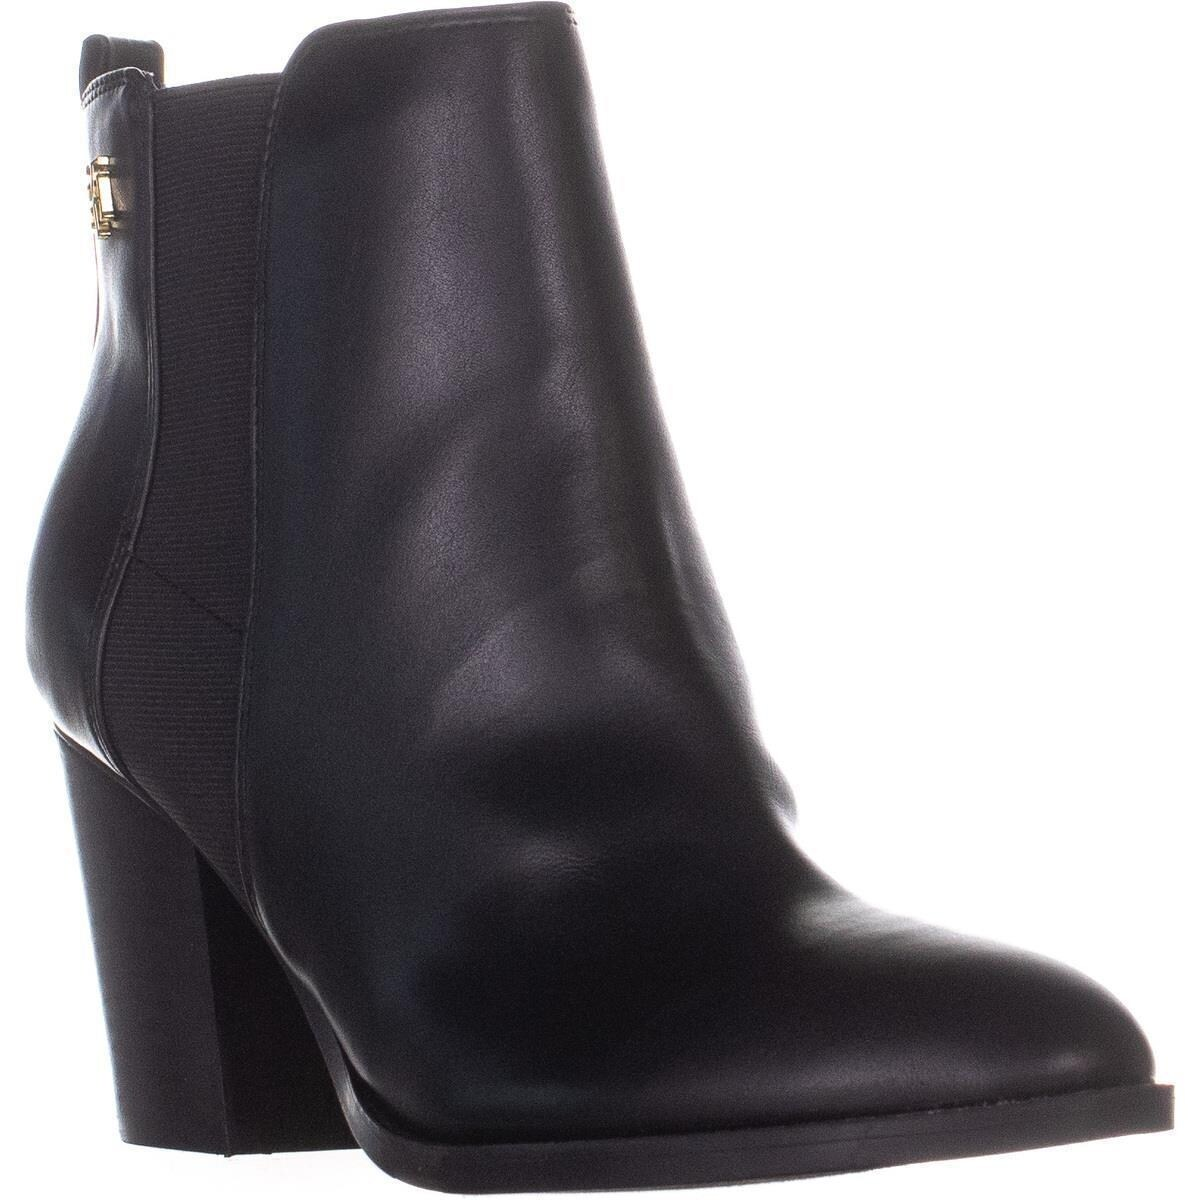 a435a9689 Shop Tommy Hilfiger Regise2 Ankle Boots